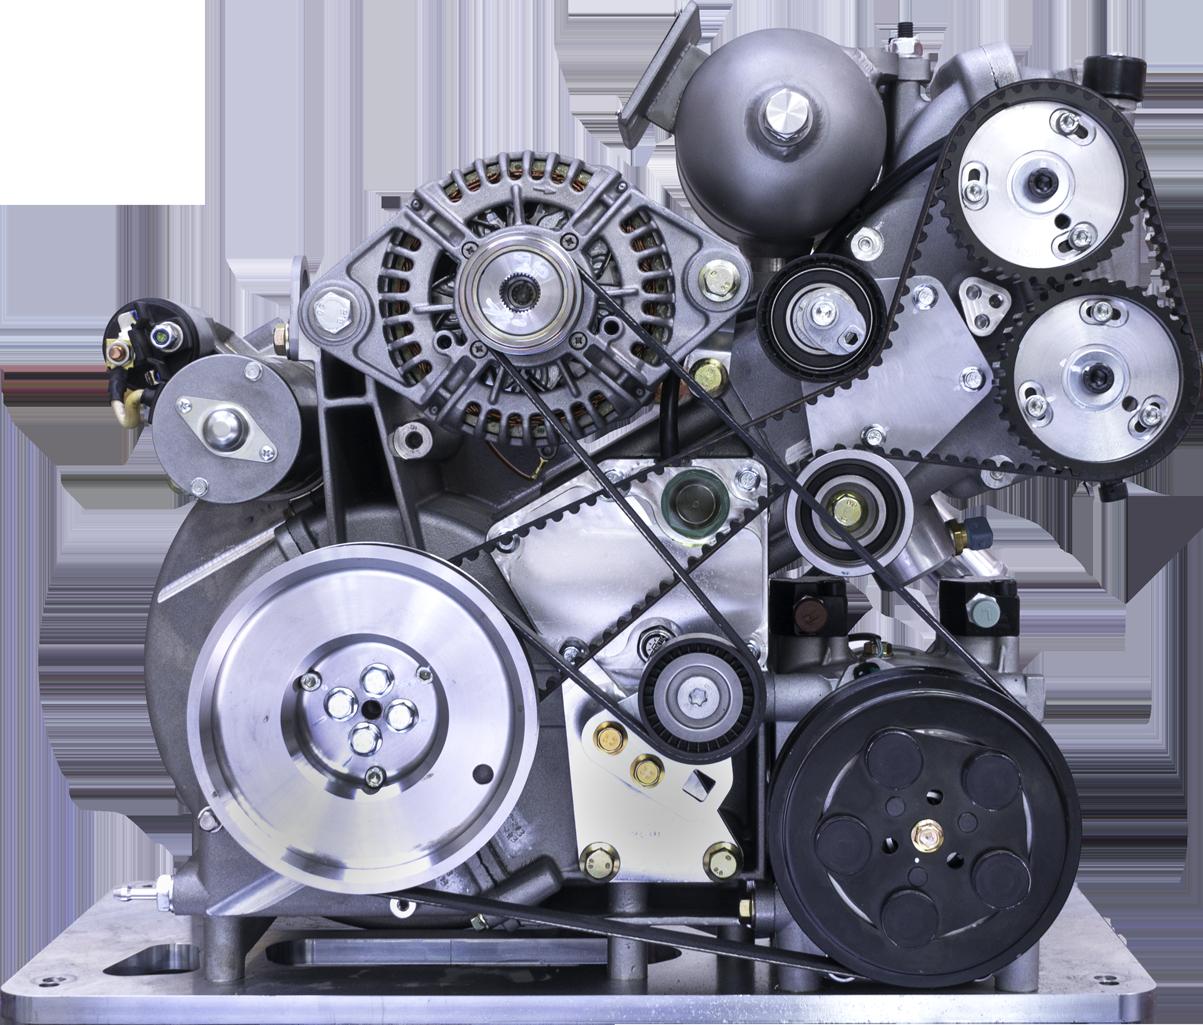 Dearman engine